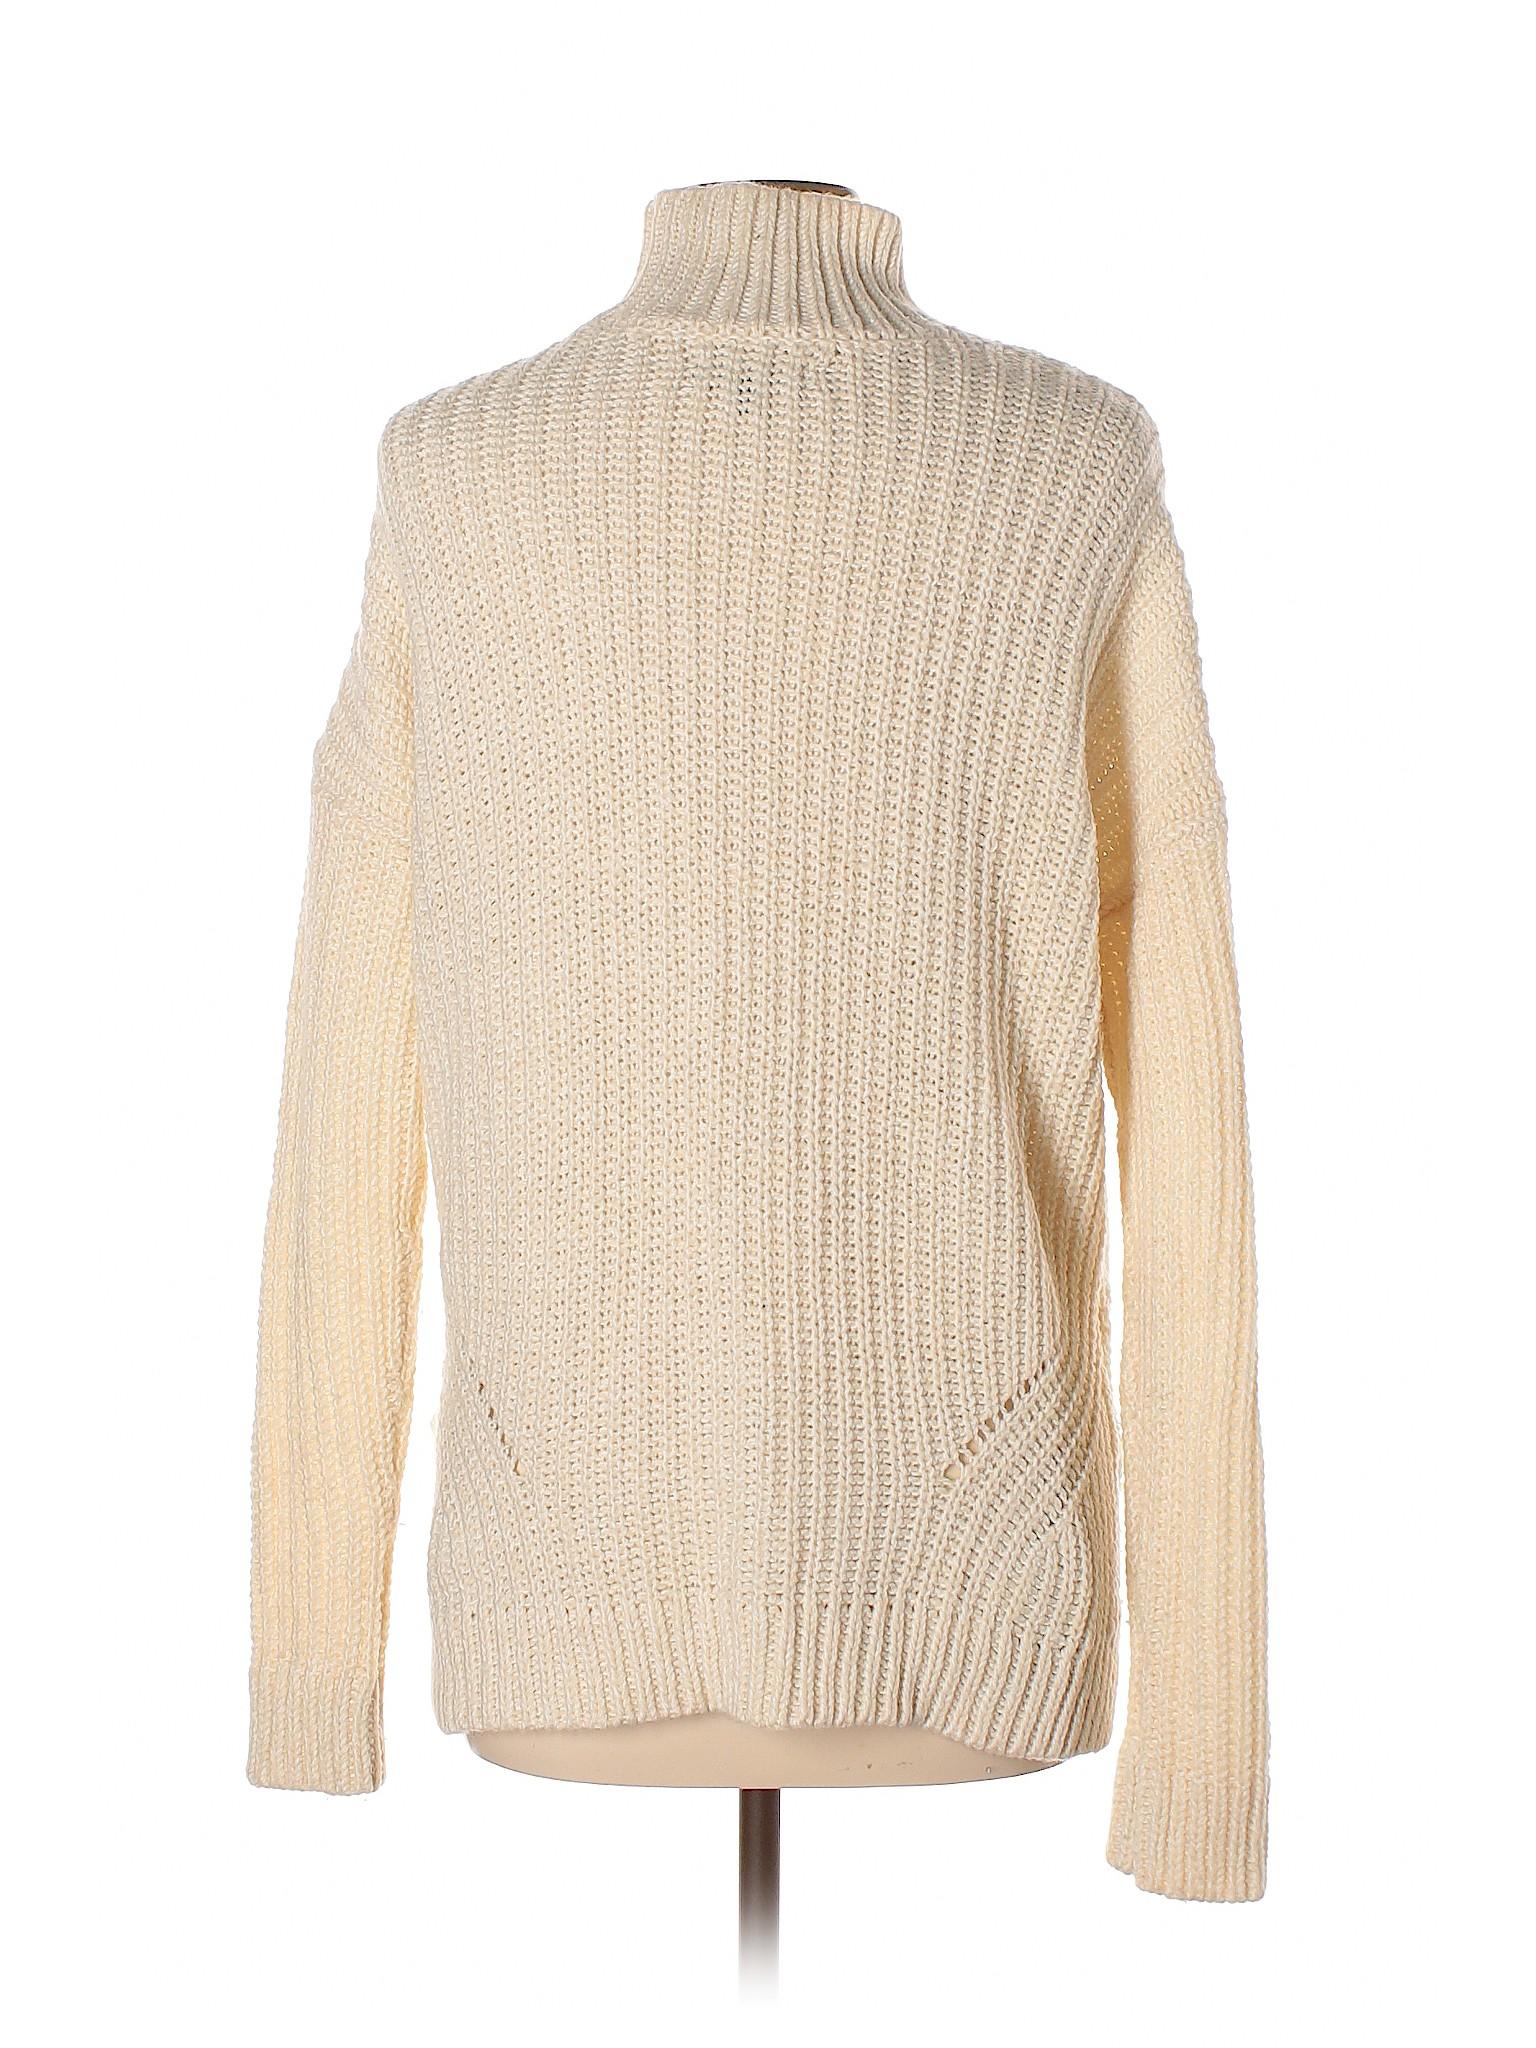 Ann Pullover Sweater Boutique Pullover Ann Sweater Taylor Boutique Boutique Boutique Taylor Pullover Ann Taylor Sweater 4Oxw4q